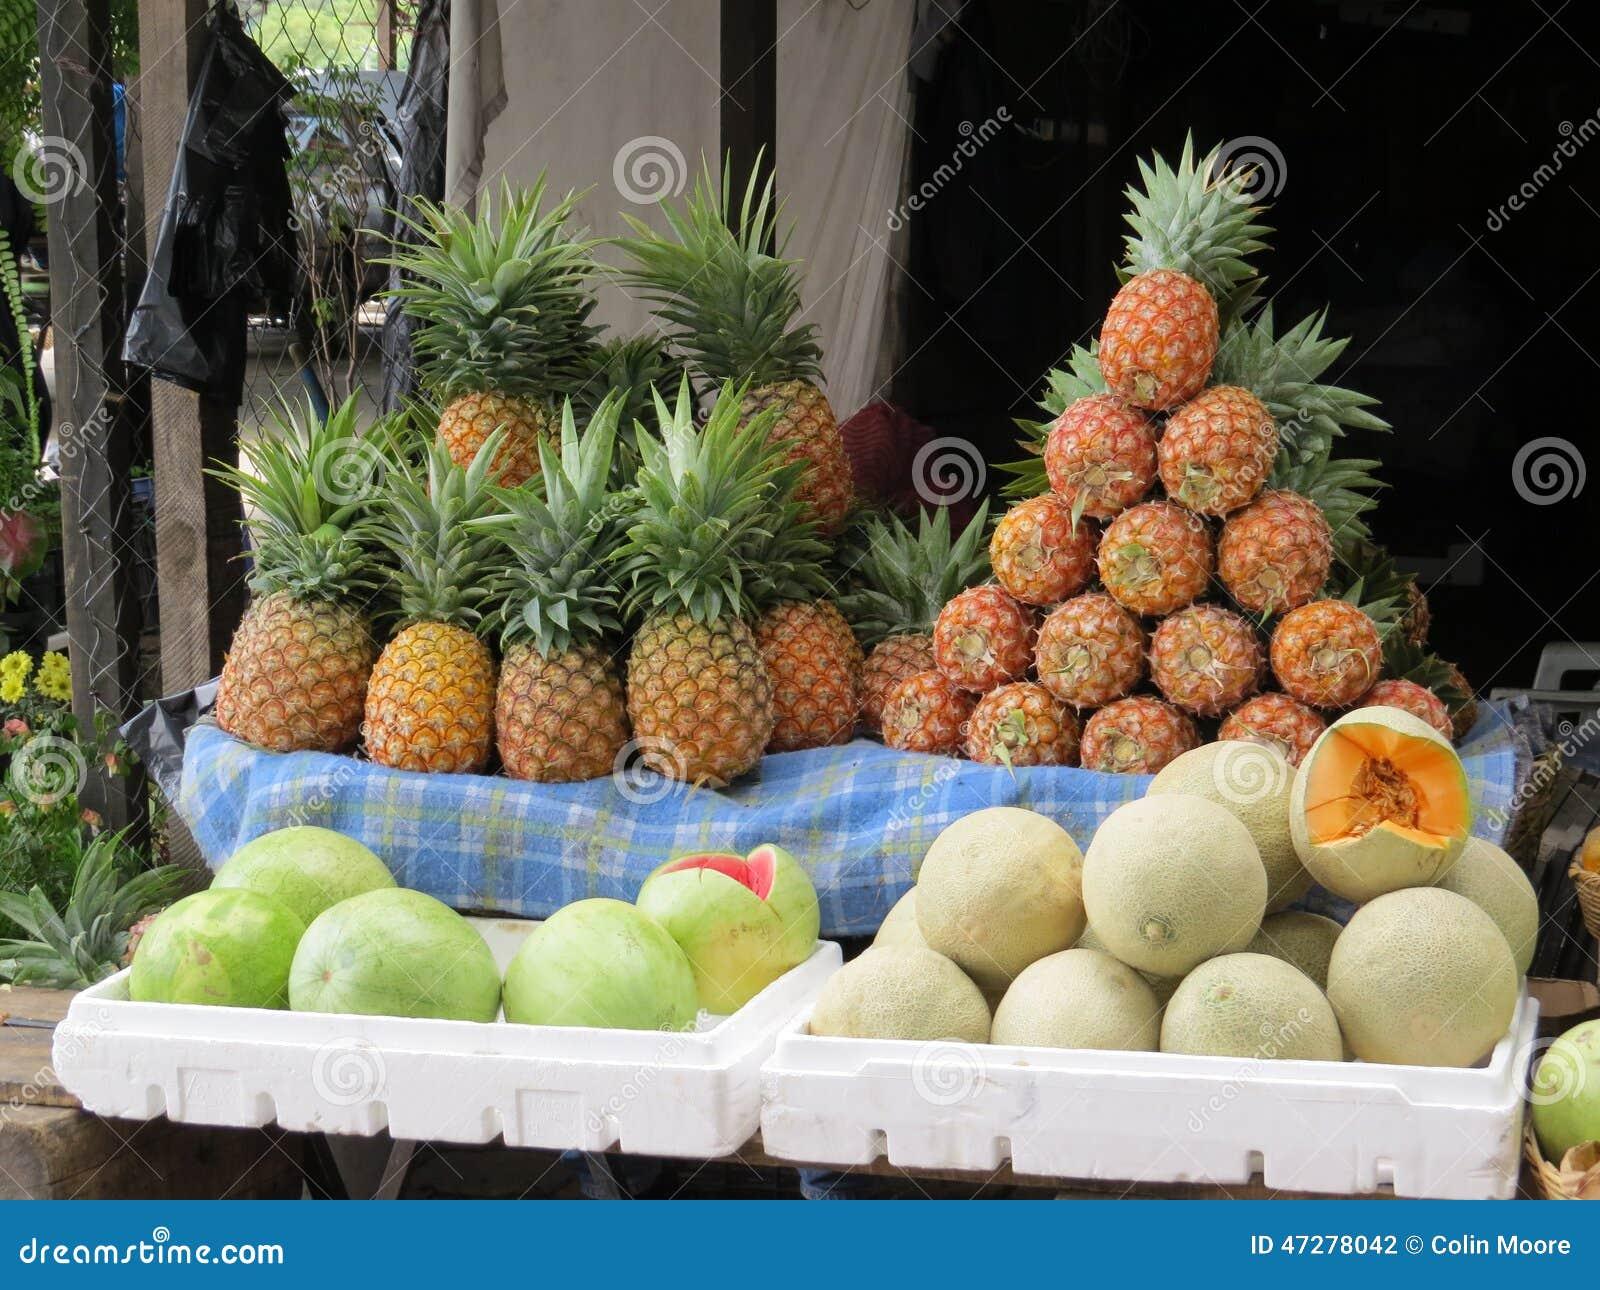 Antigua market stall